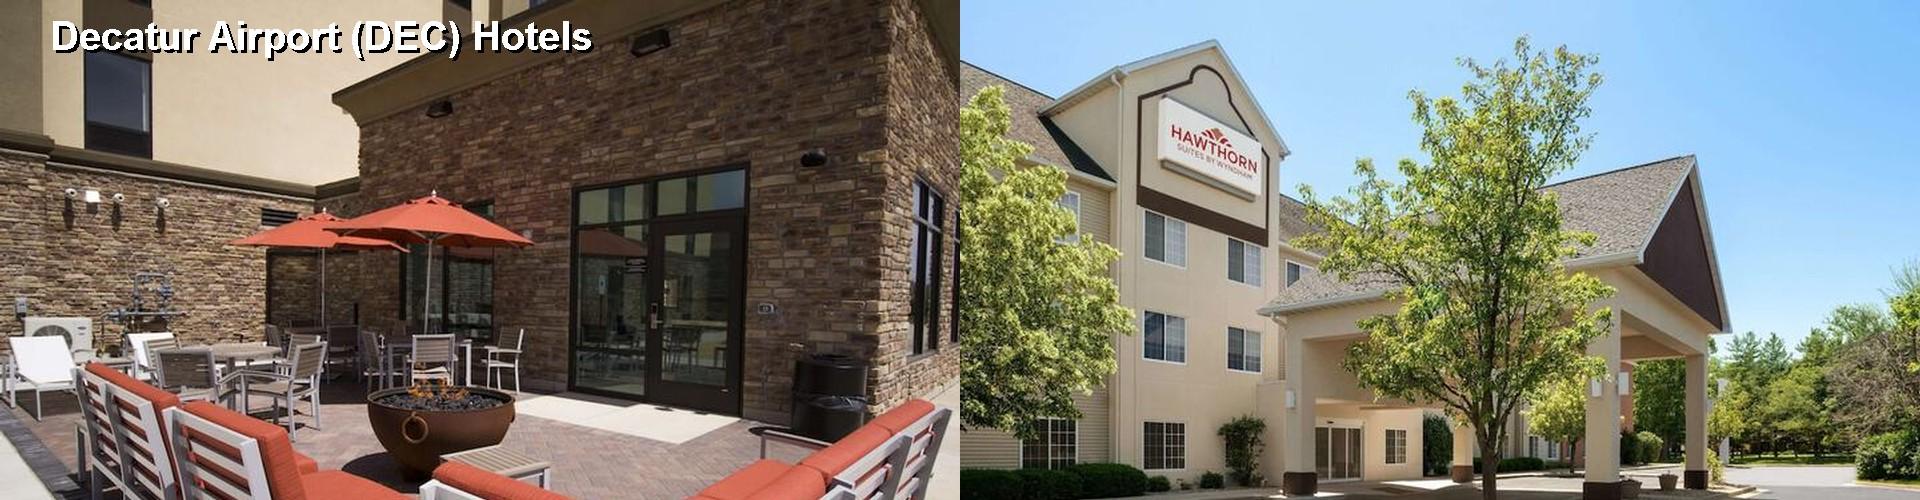 5 Best Hotels Near Decatur Airport Dec